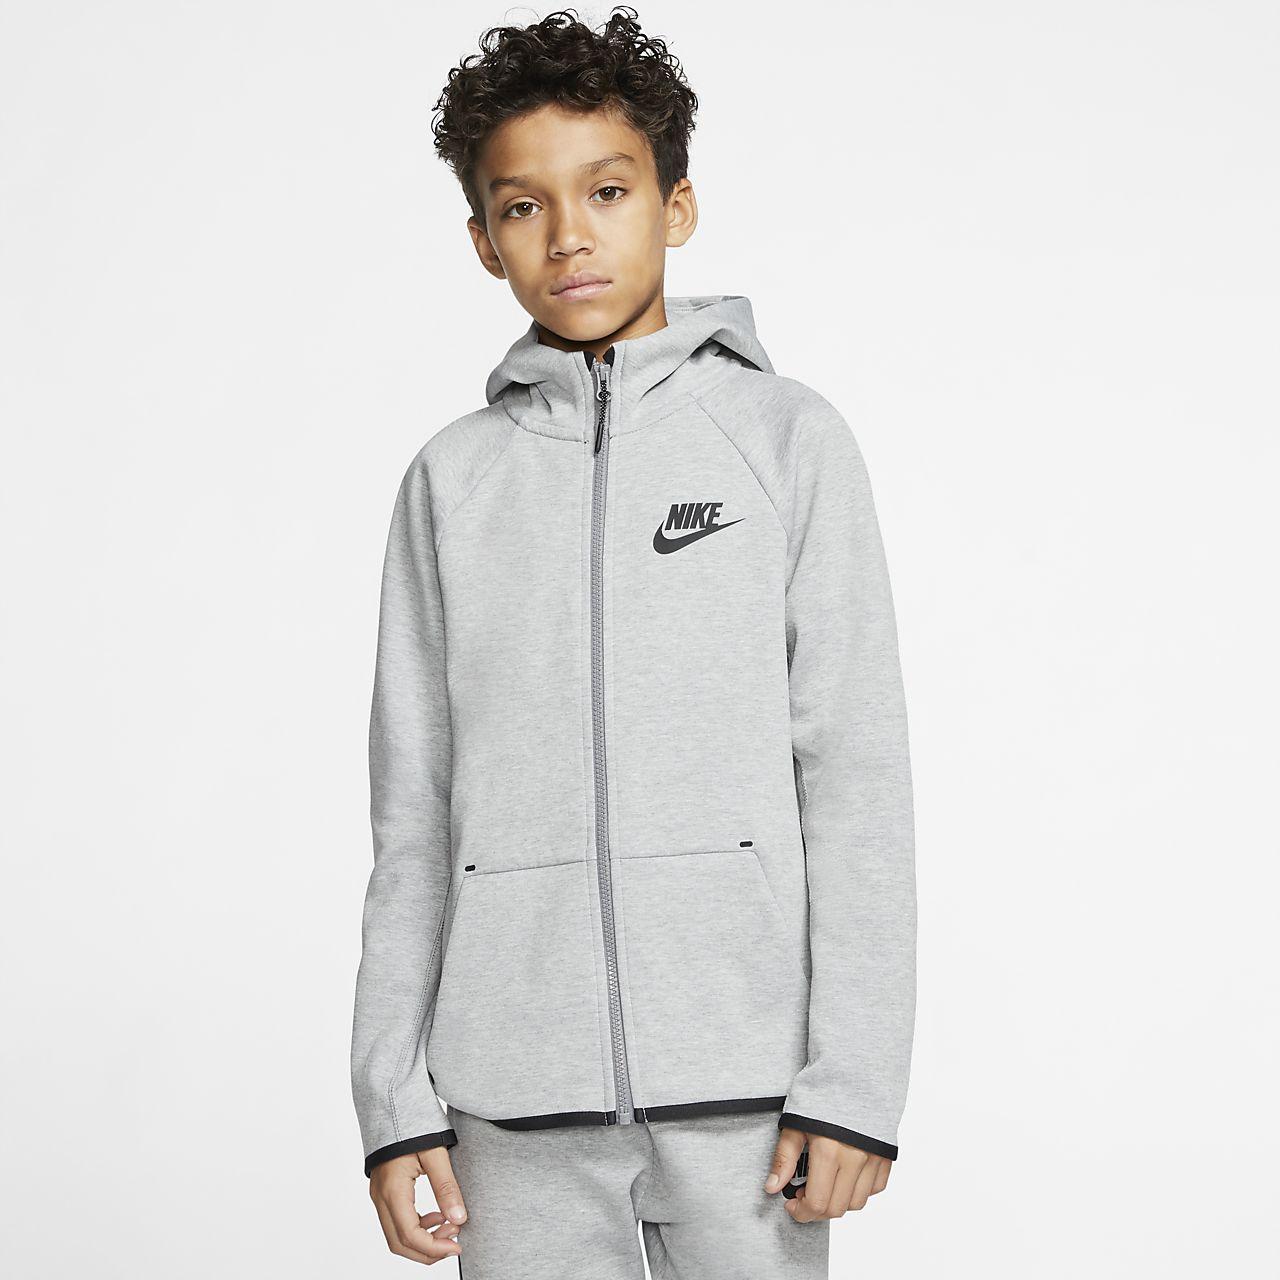 Nike Sportswear Tech Fleece-jakke med lynlås i fuld længde til store børn